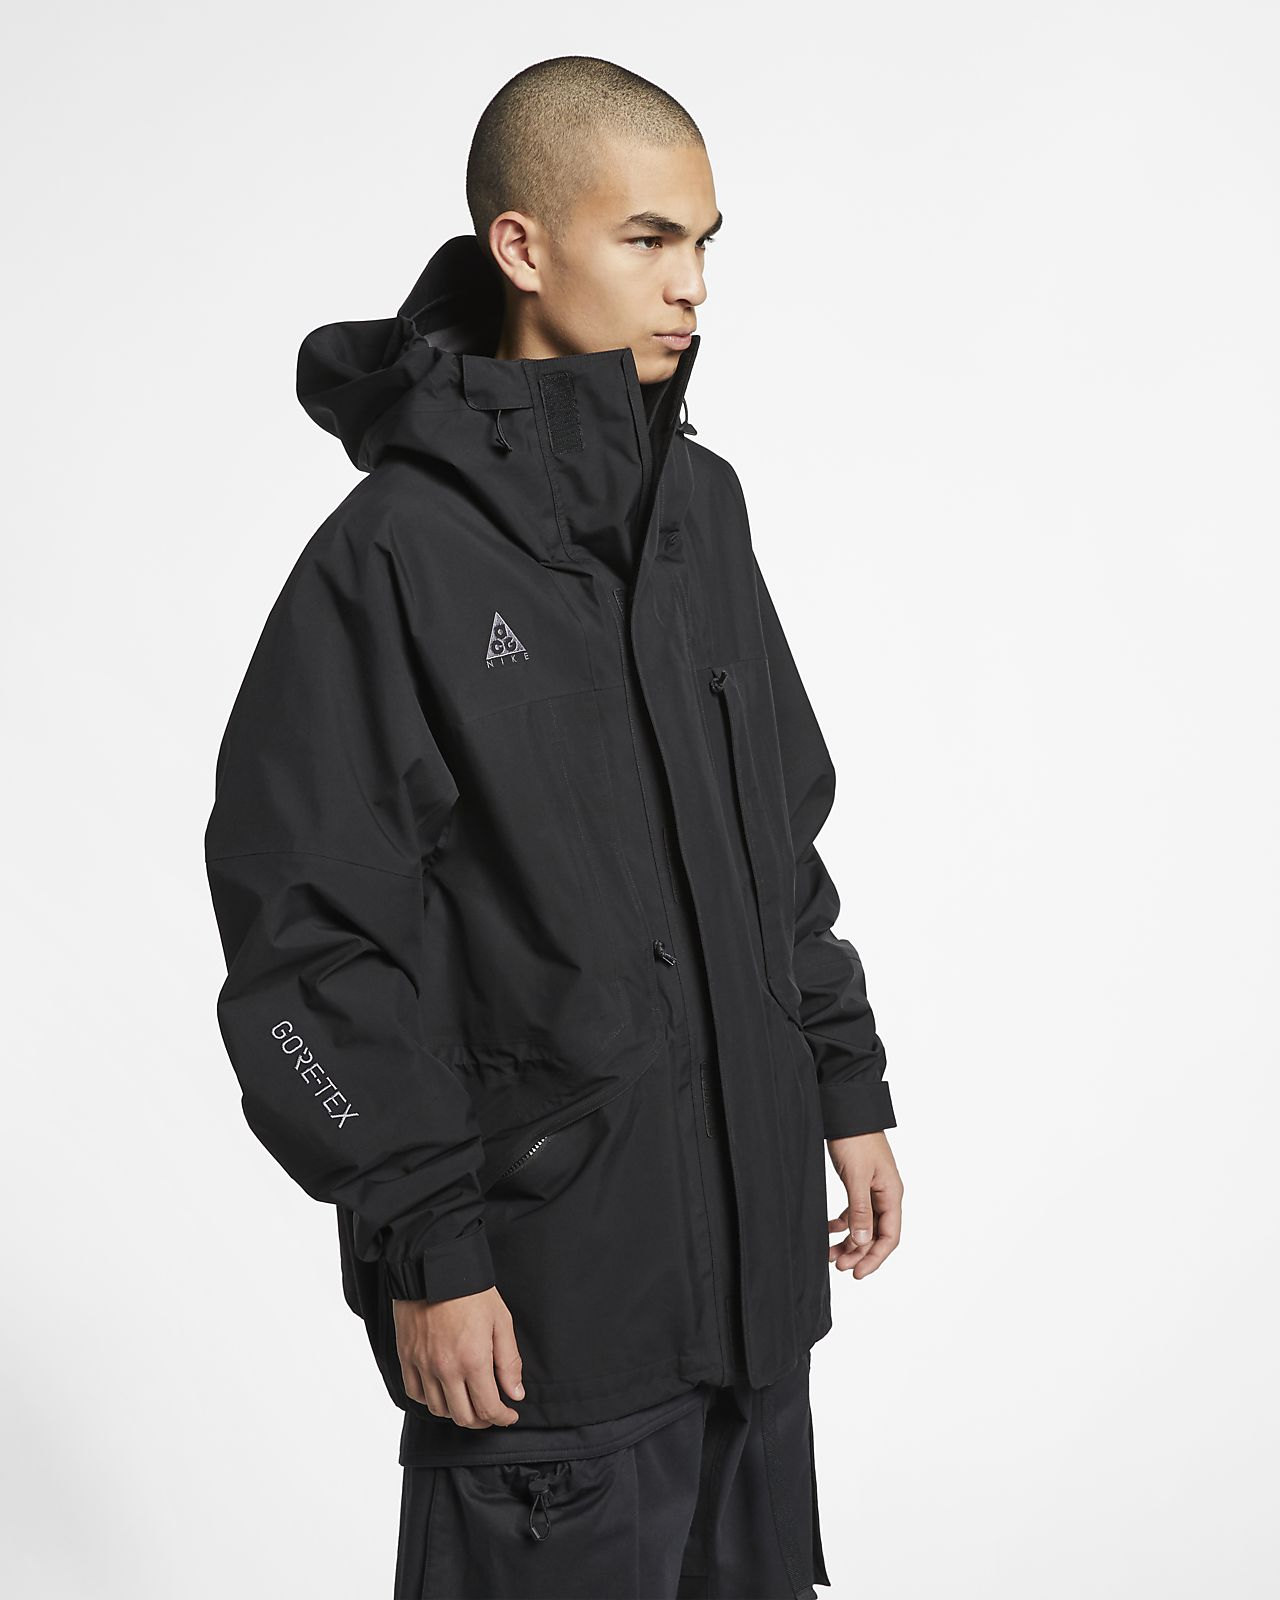 701abab44af8 Nike ACG GORE-TEX® Men s Jacket . Nike.com